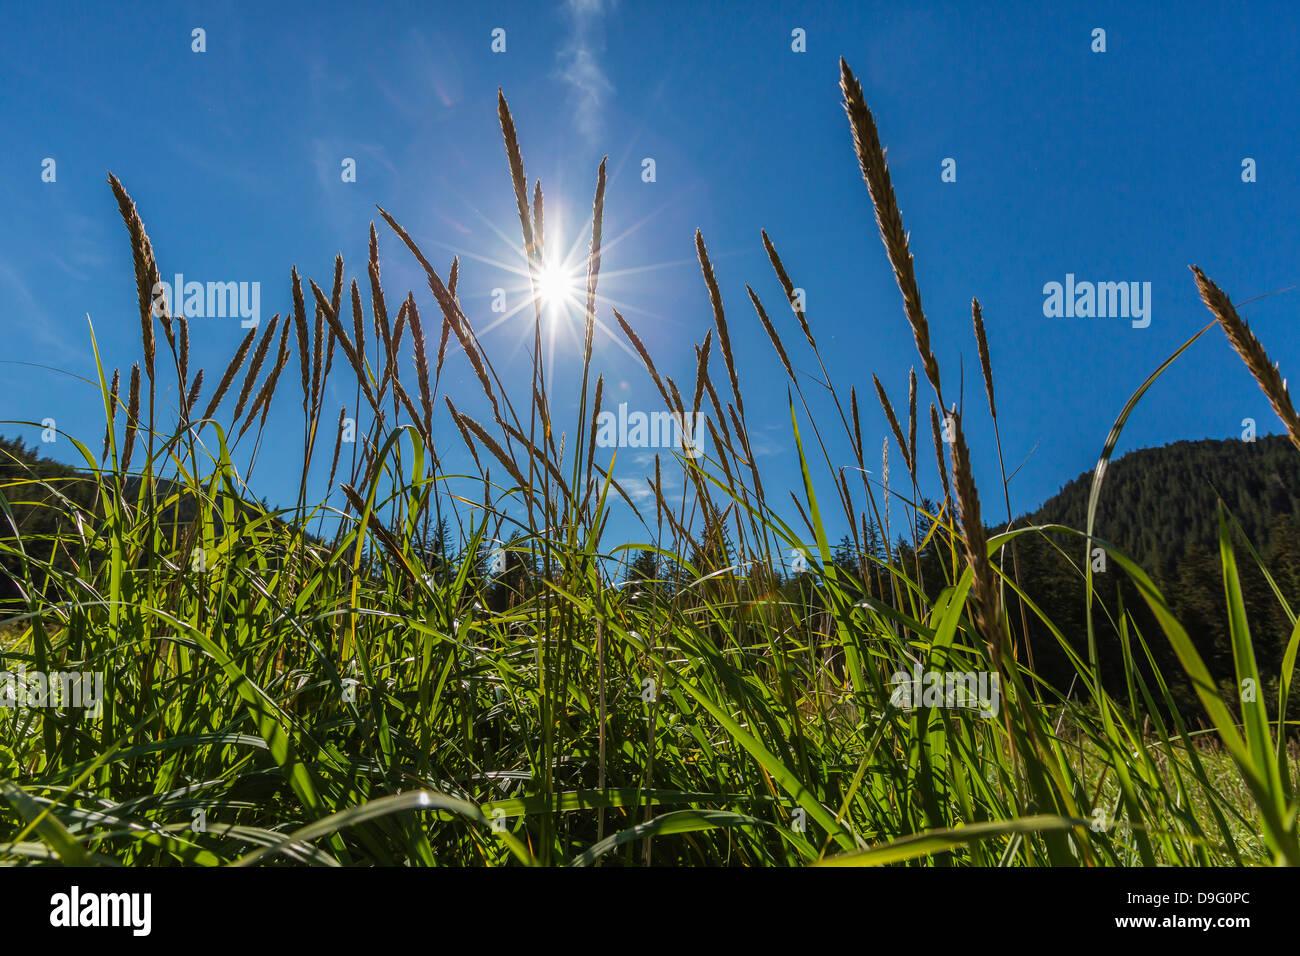 Sun shining through grass on Chichagof Island, Southeast Alaska, USA - Stock Image